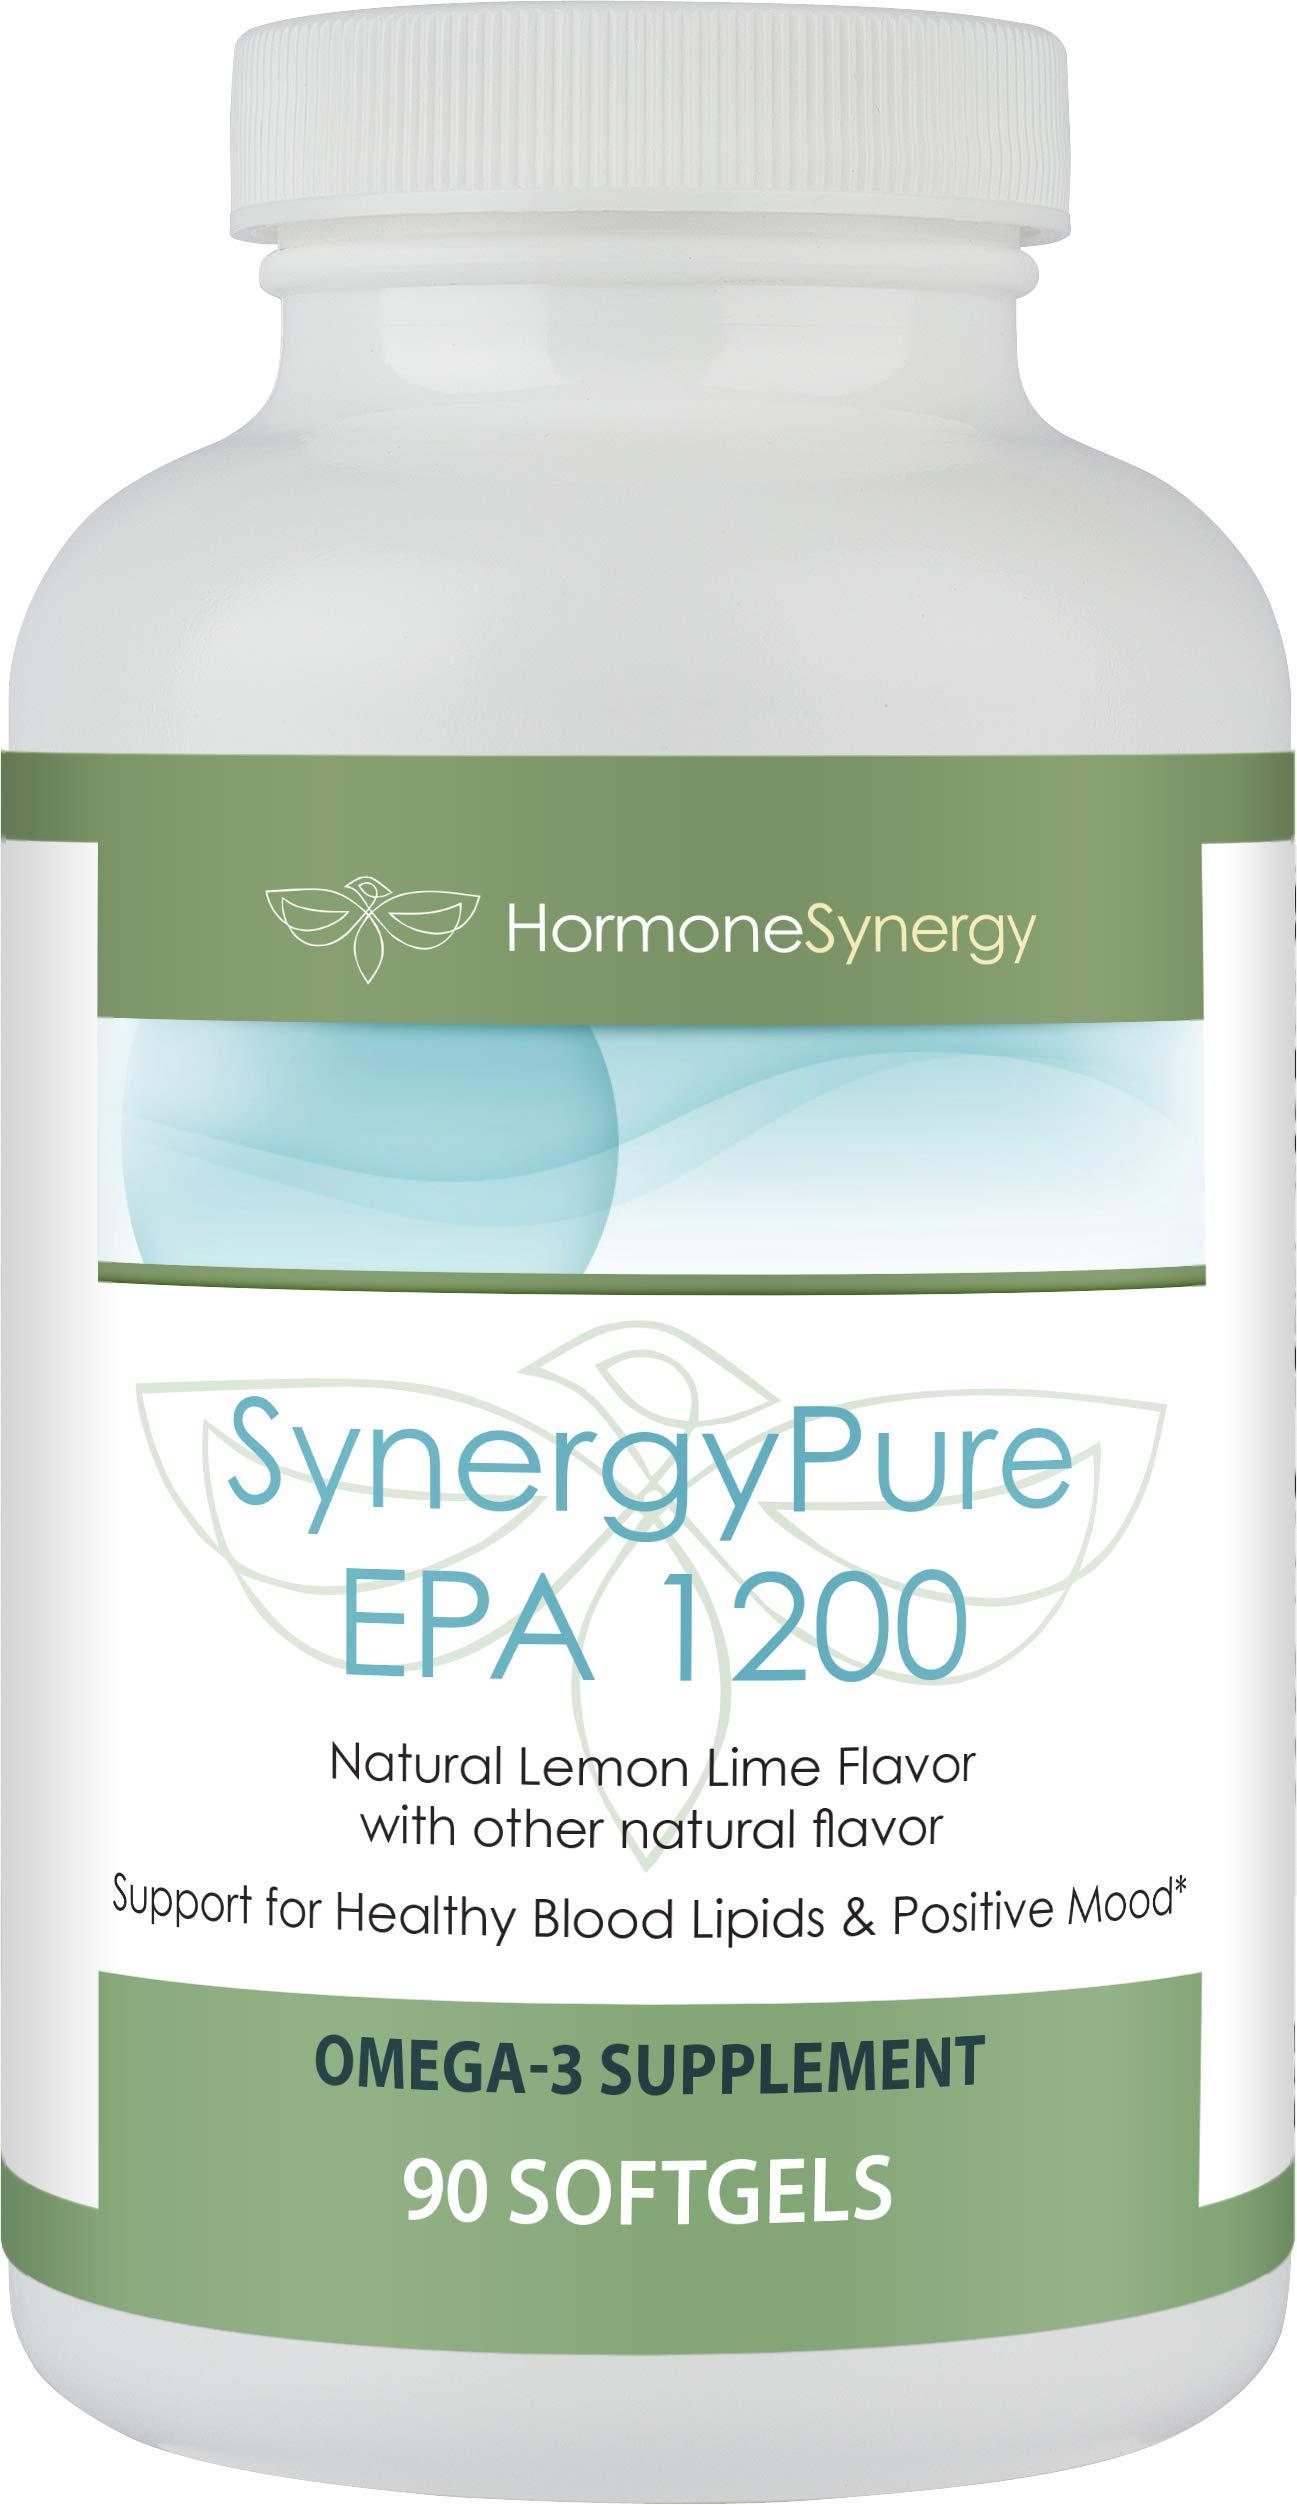 SynergyPure EPA 1200 90 Softgels | Each SynergyPure EPA 1200 softgel Provides a Total of 1200 mg of EPA | Support for Healthy Blood Lipids & Positive Mood*